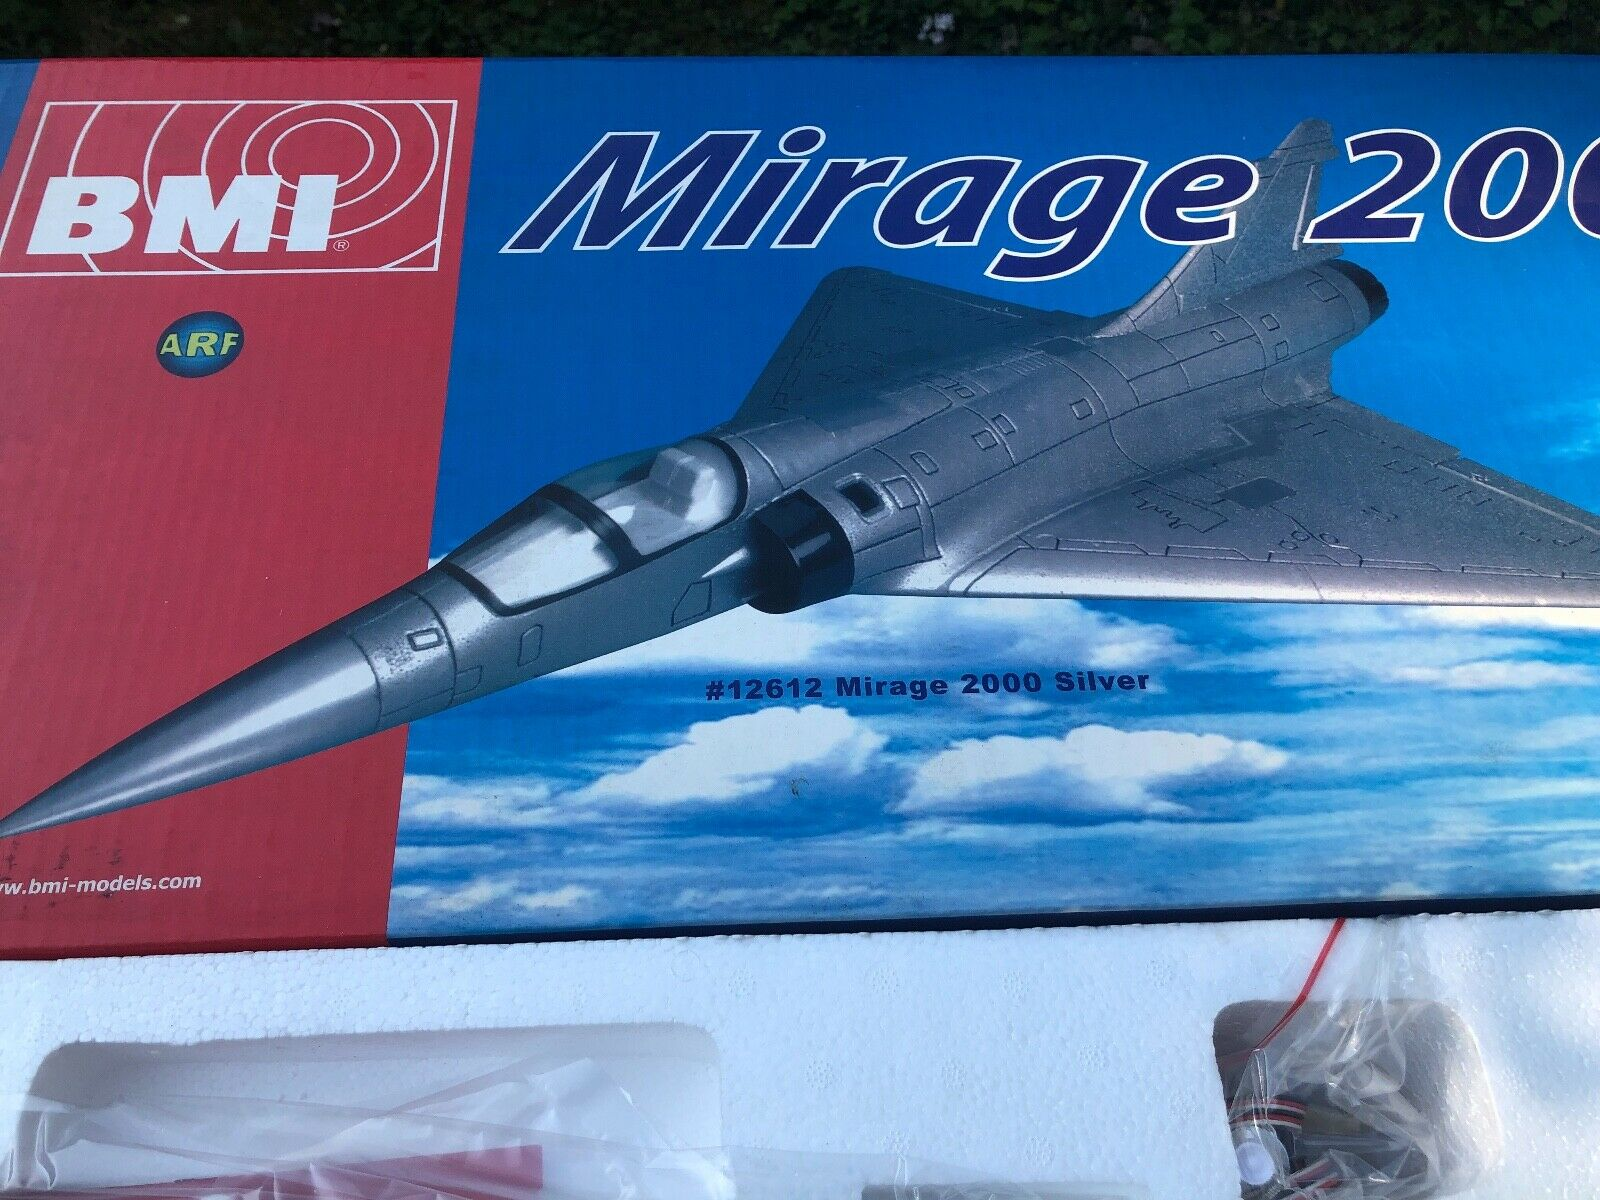 Mirage 2000 RC Impeller jet